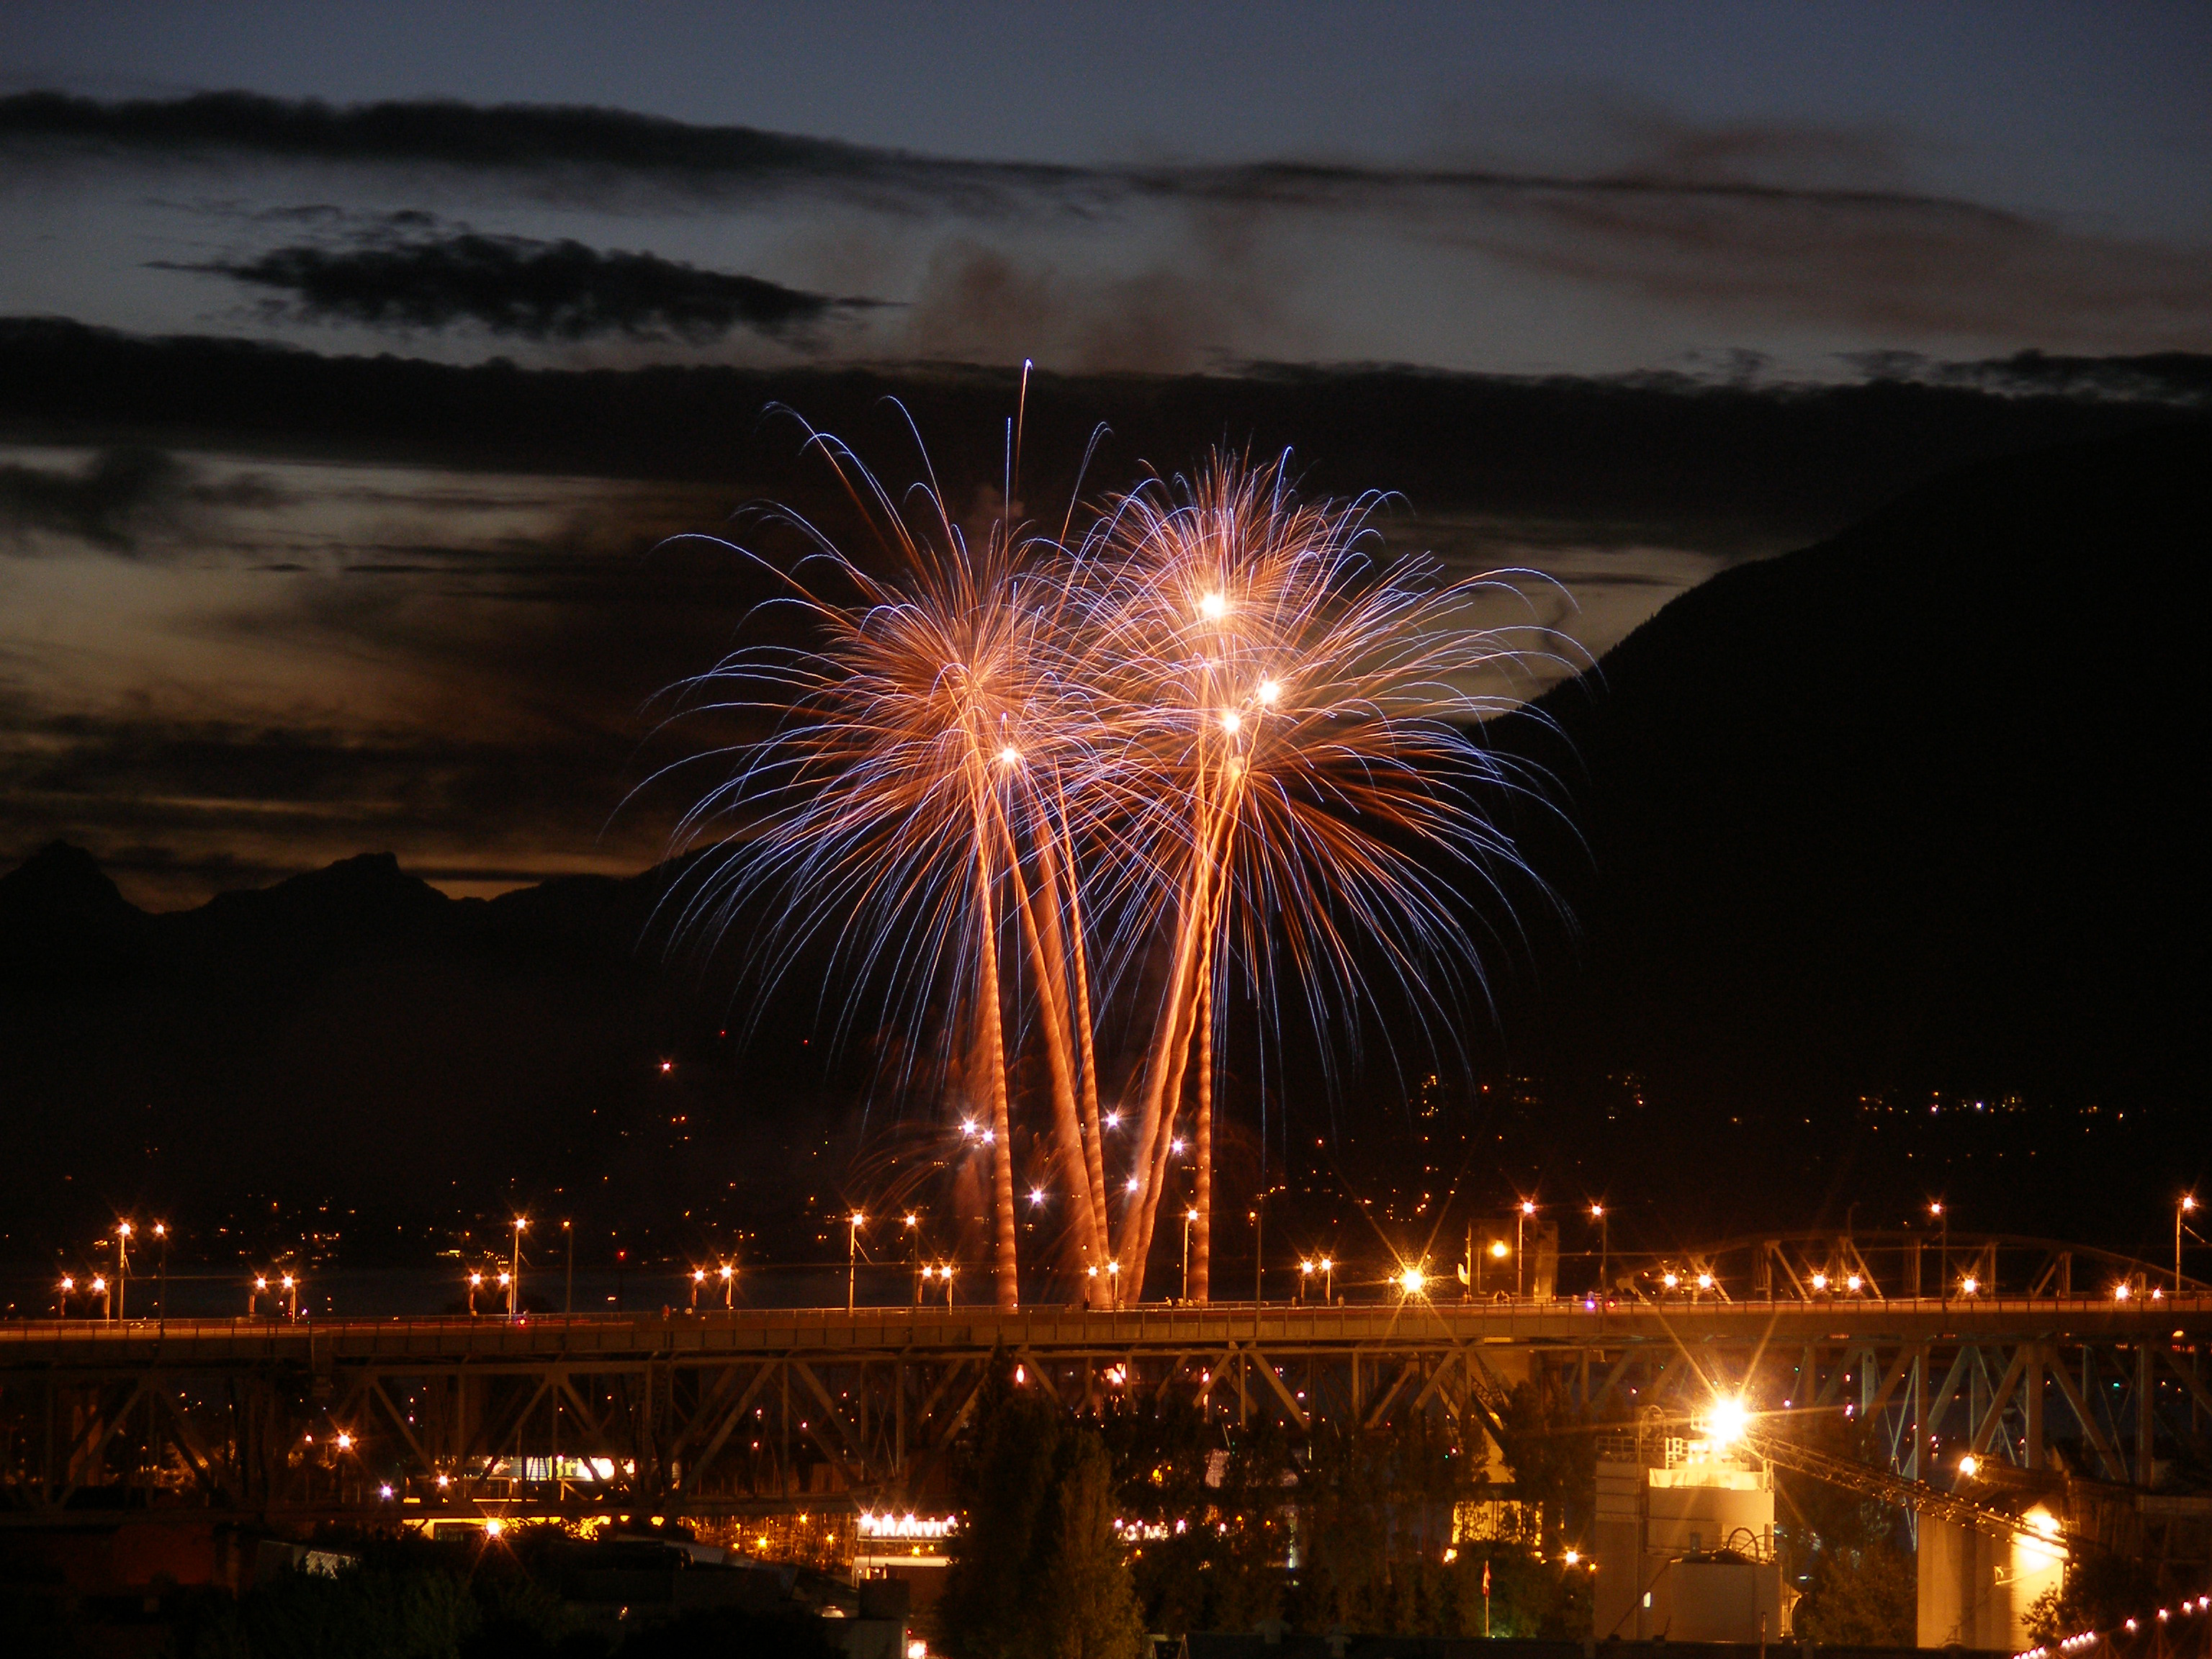 http://upload.wikimedia.org/wikipedia/commons/c/c9/Fireworks_vancouver.jpg